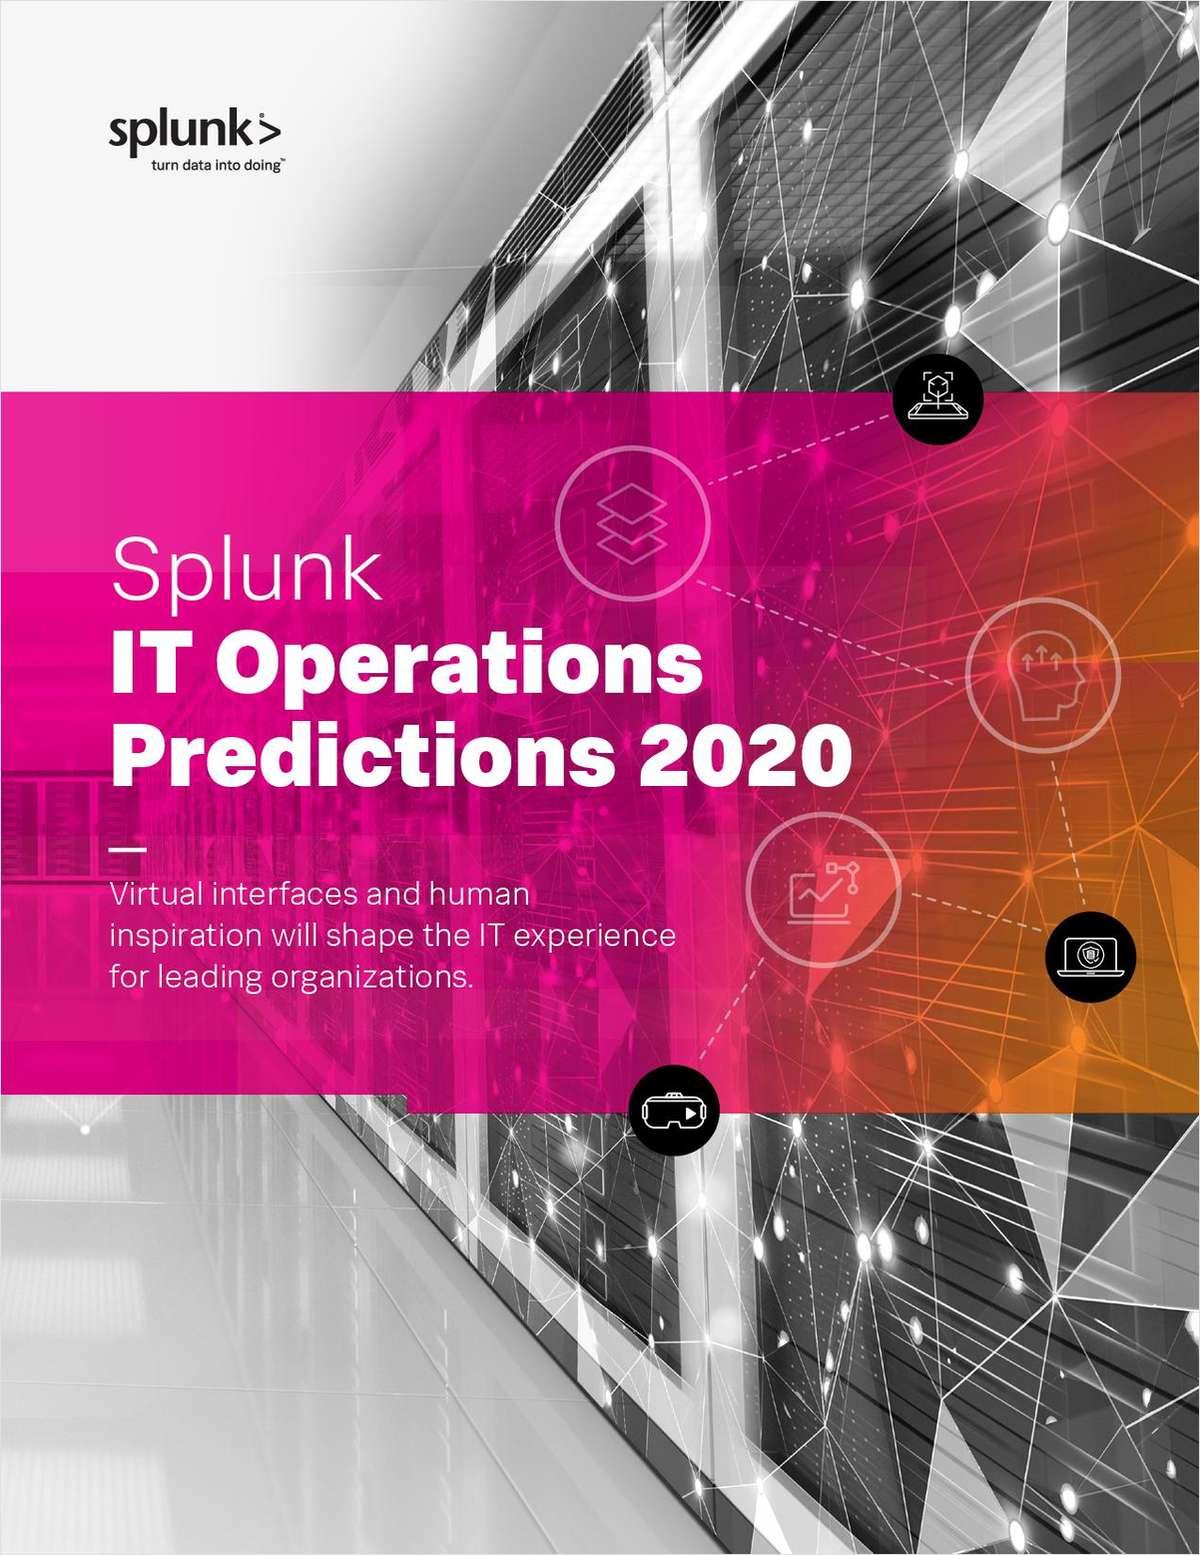 Splunk IT Predictions 2020